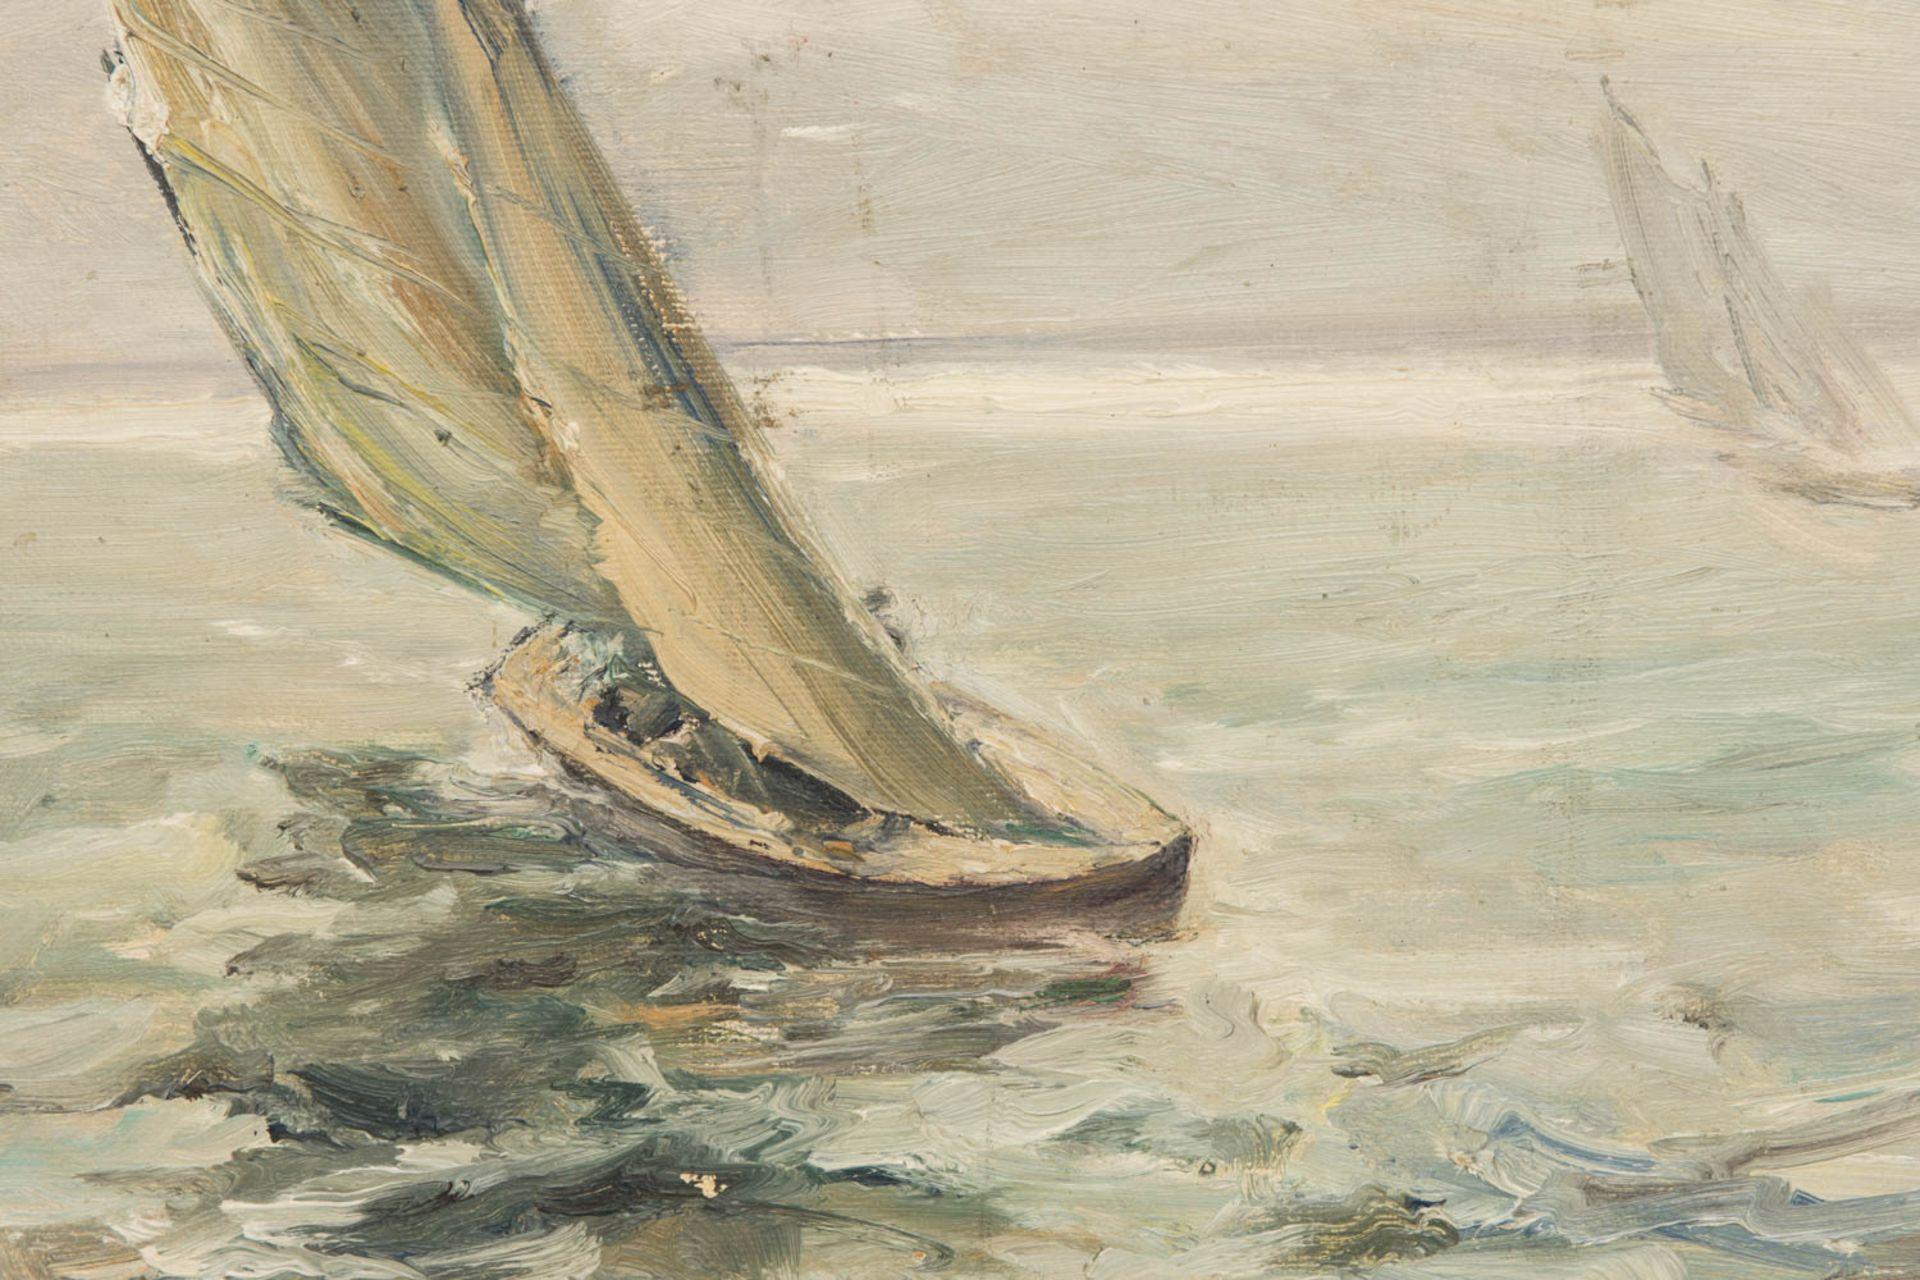 Paul Kapell, Segelboot, Öl auf Karton, 19./20. Jh.Landschaftsansicht, Segelboot im Wi - Bild 2 aus 6